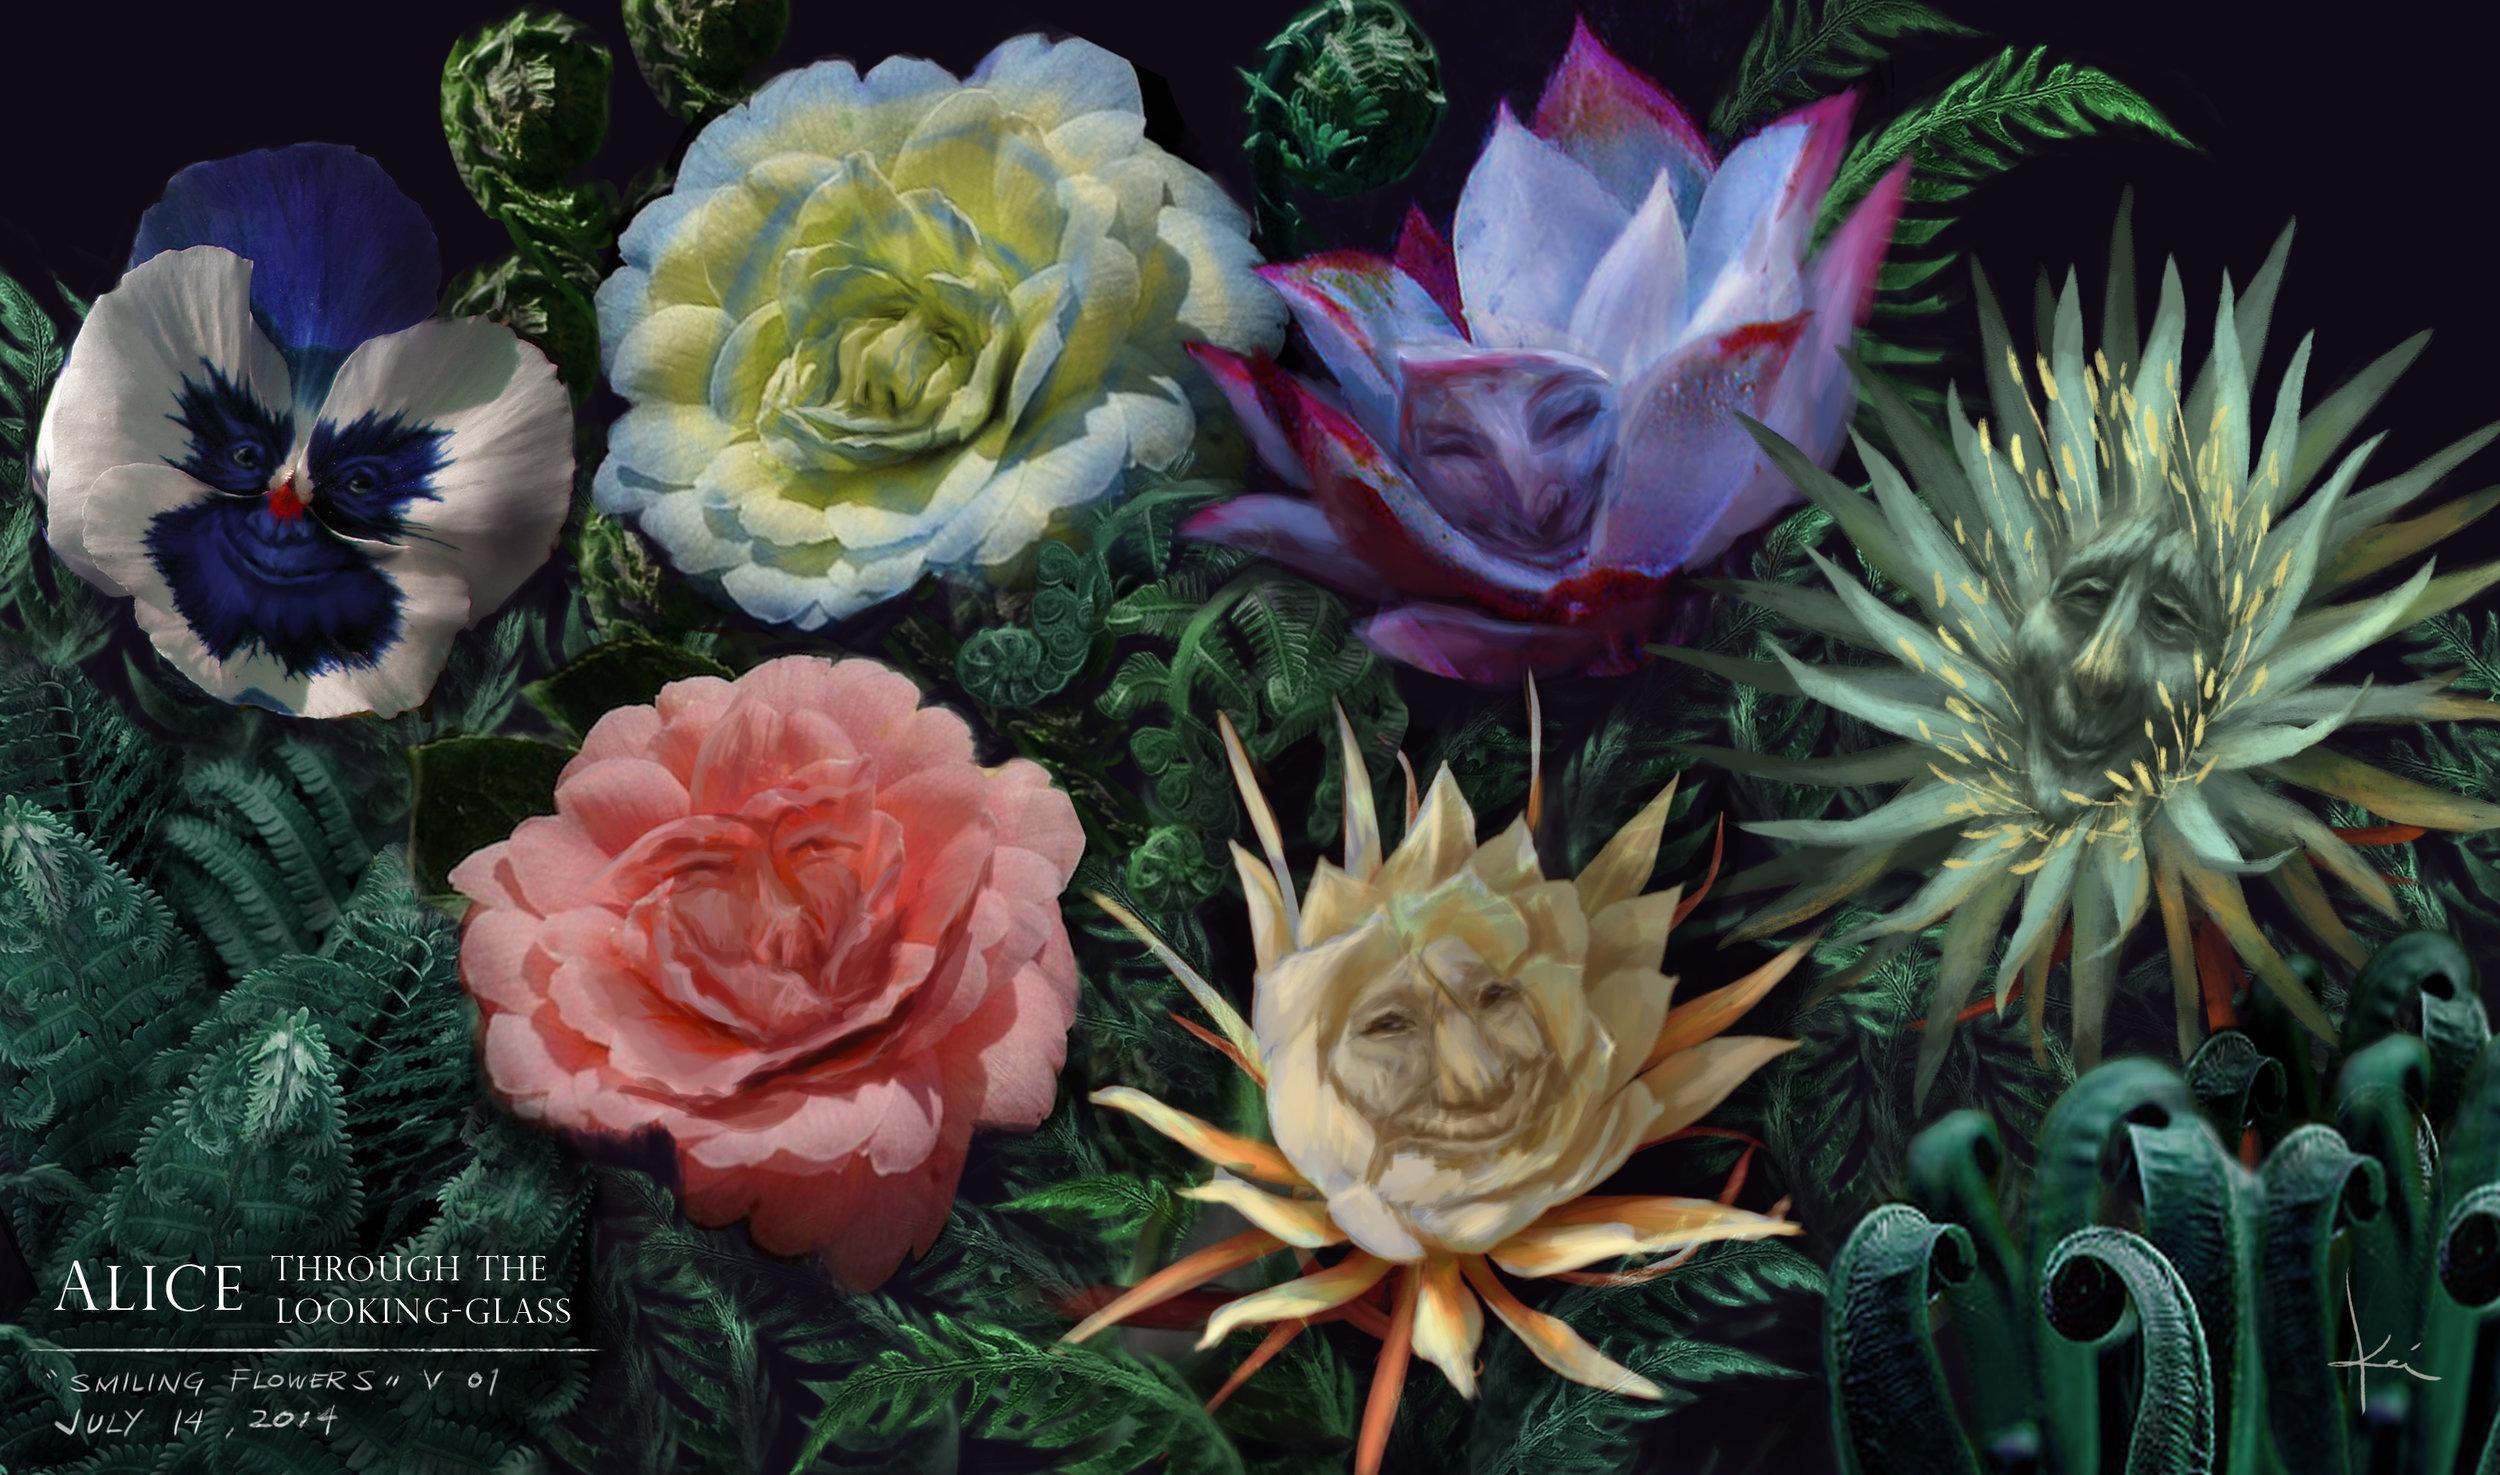 smiling_flowers_01B.jpg